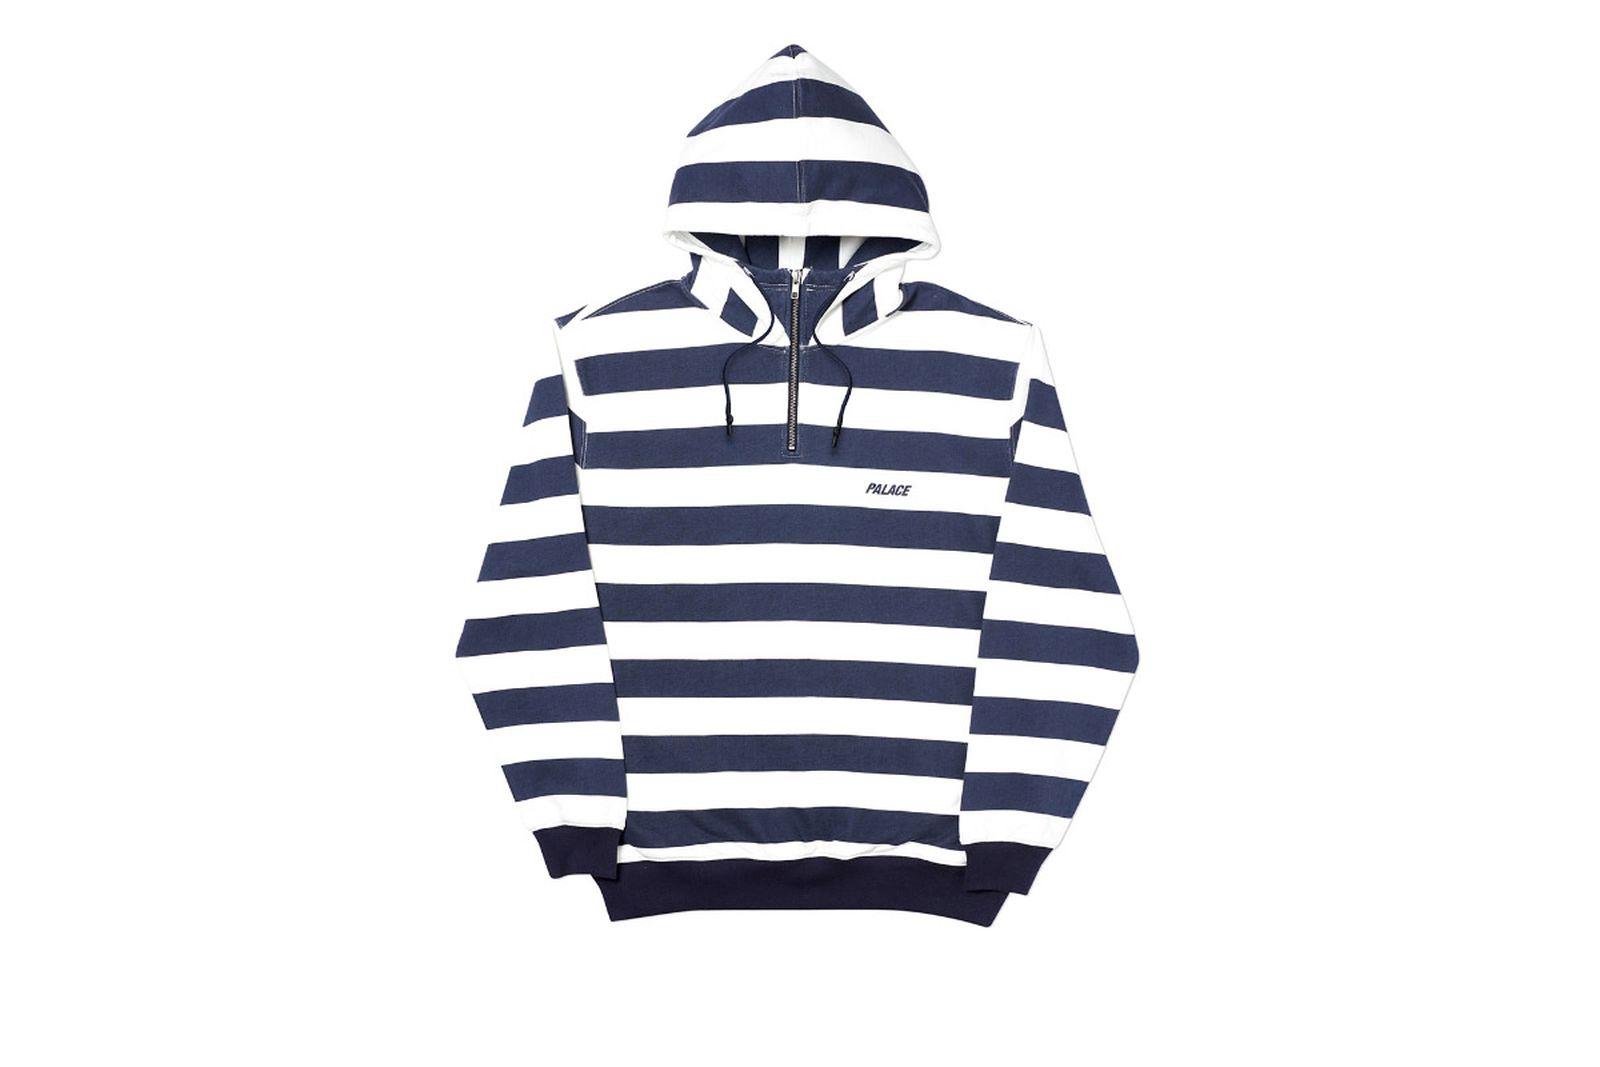 Palace 2019 Autumn Hood Tri Stripe Zip White Front